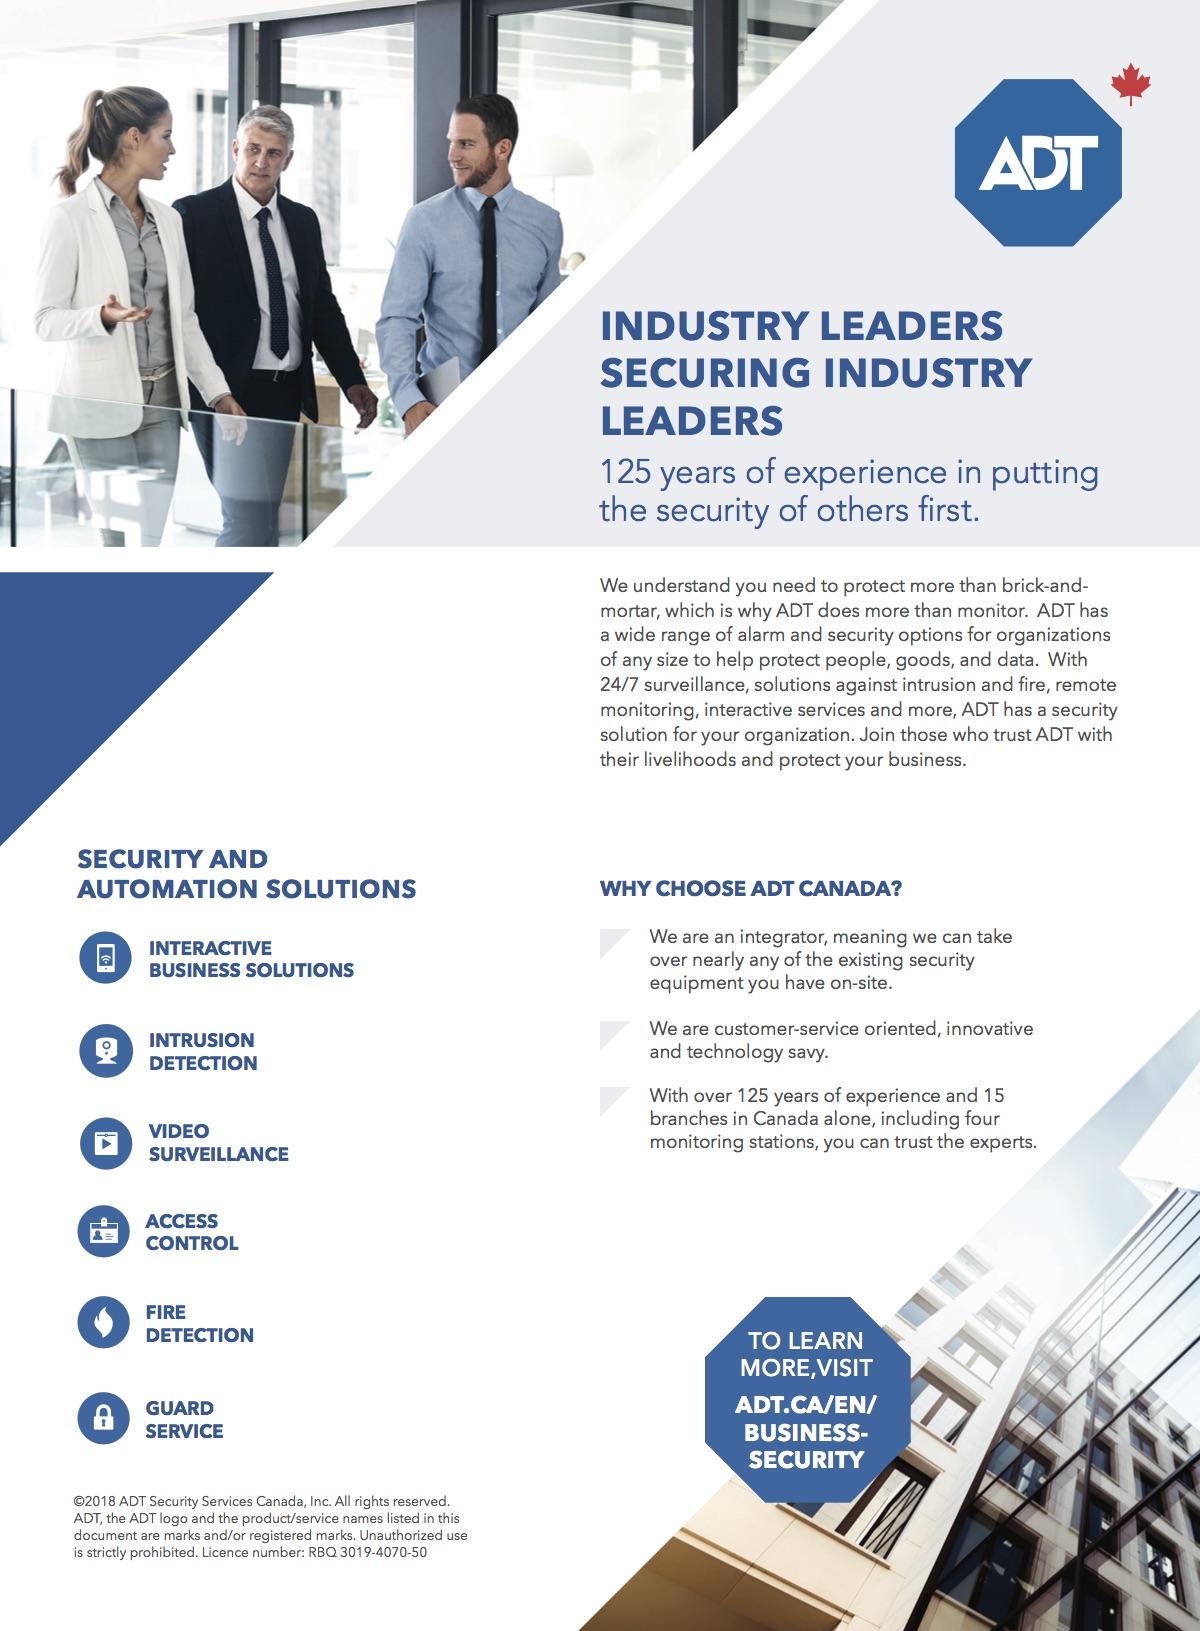 ADT business security 2018.jpg